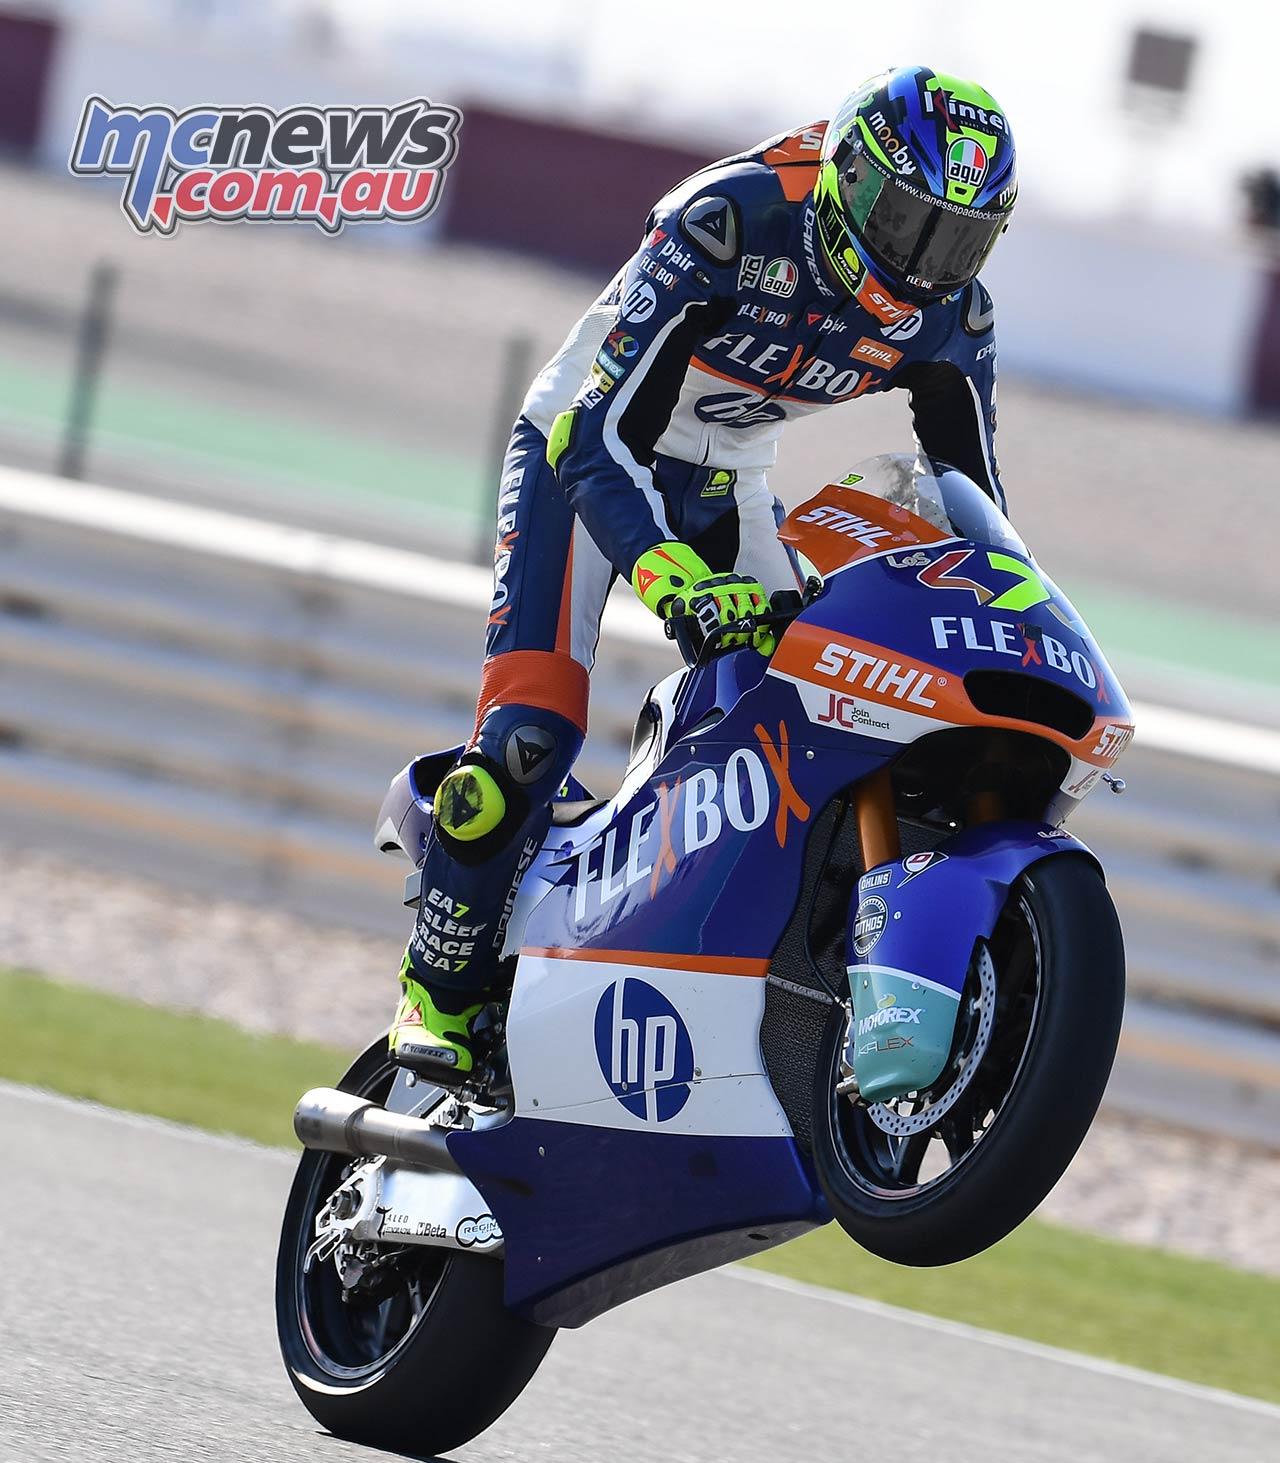 MotoGP Rnd Qatar Friday Moto Lorenzo Baldassarri